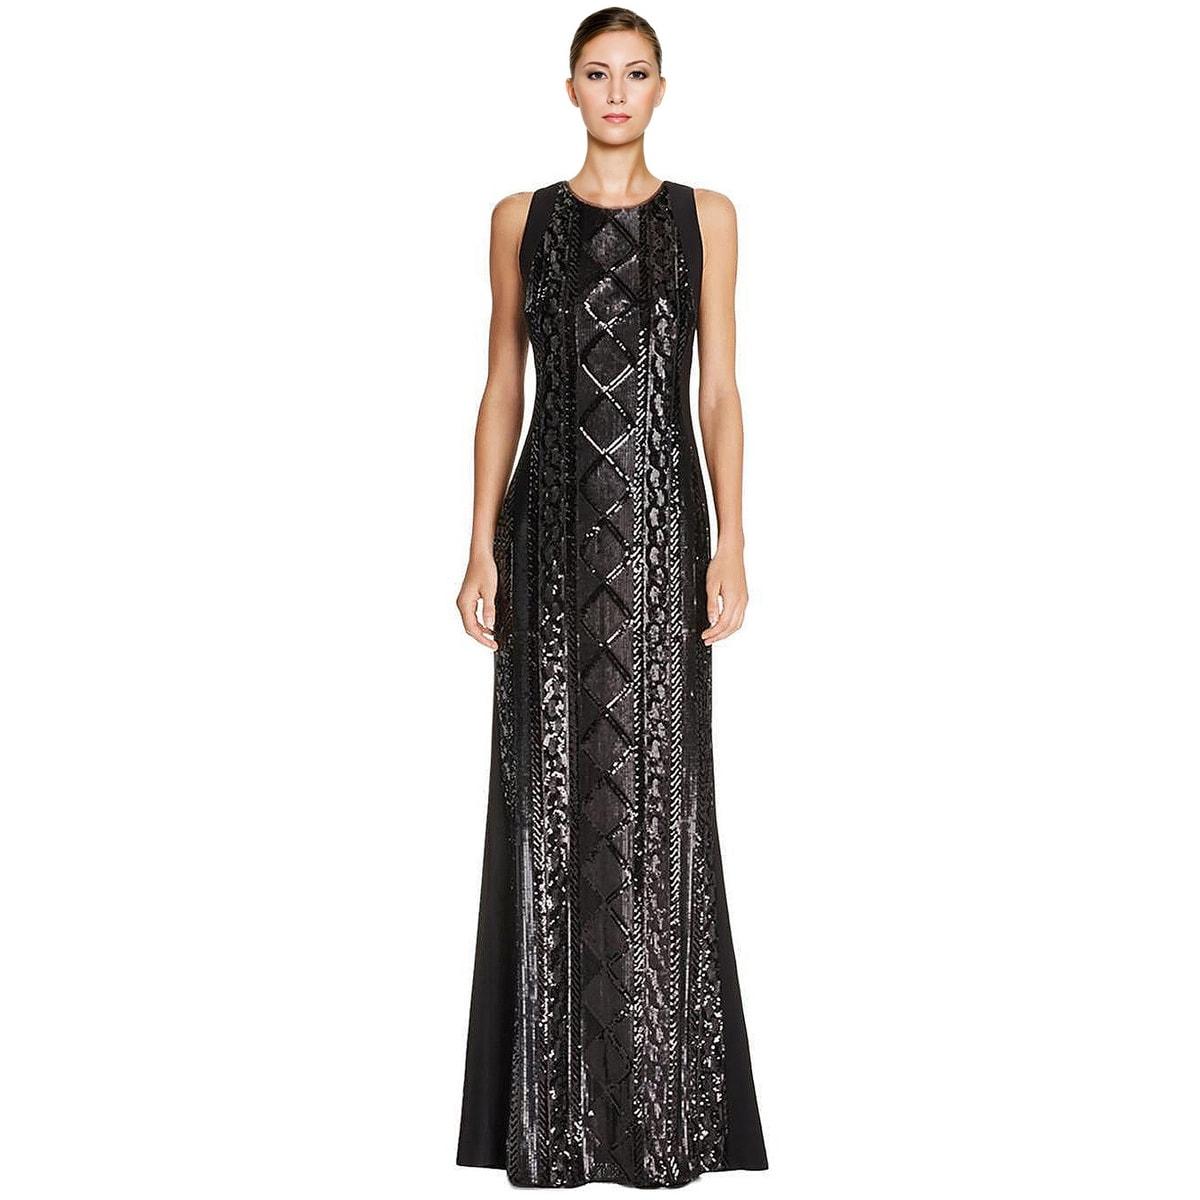 Shop Adrianna Papell Geometric Sequin Embellished Sleeveless Evening ...